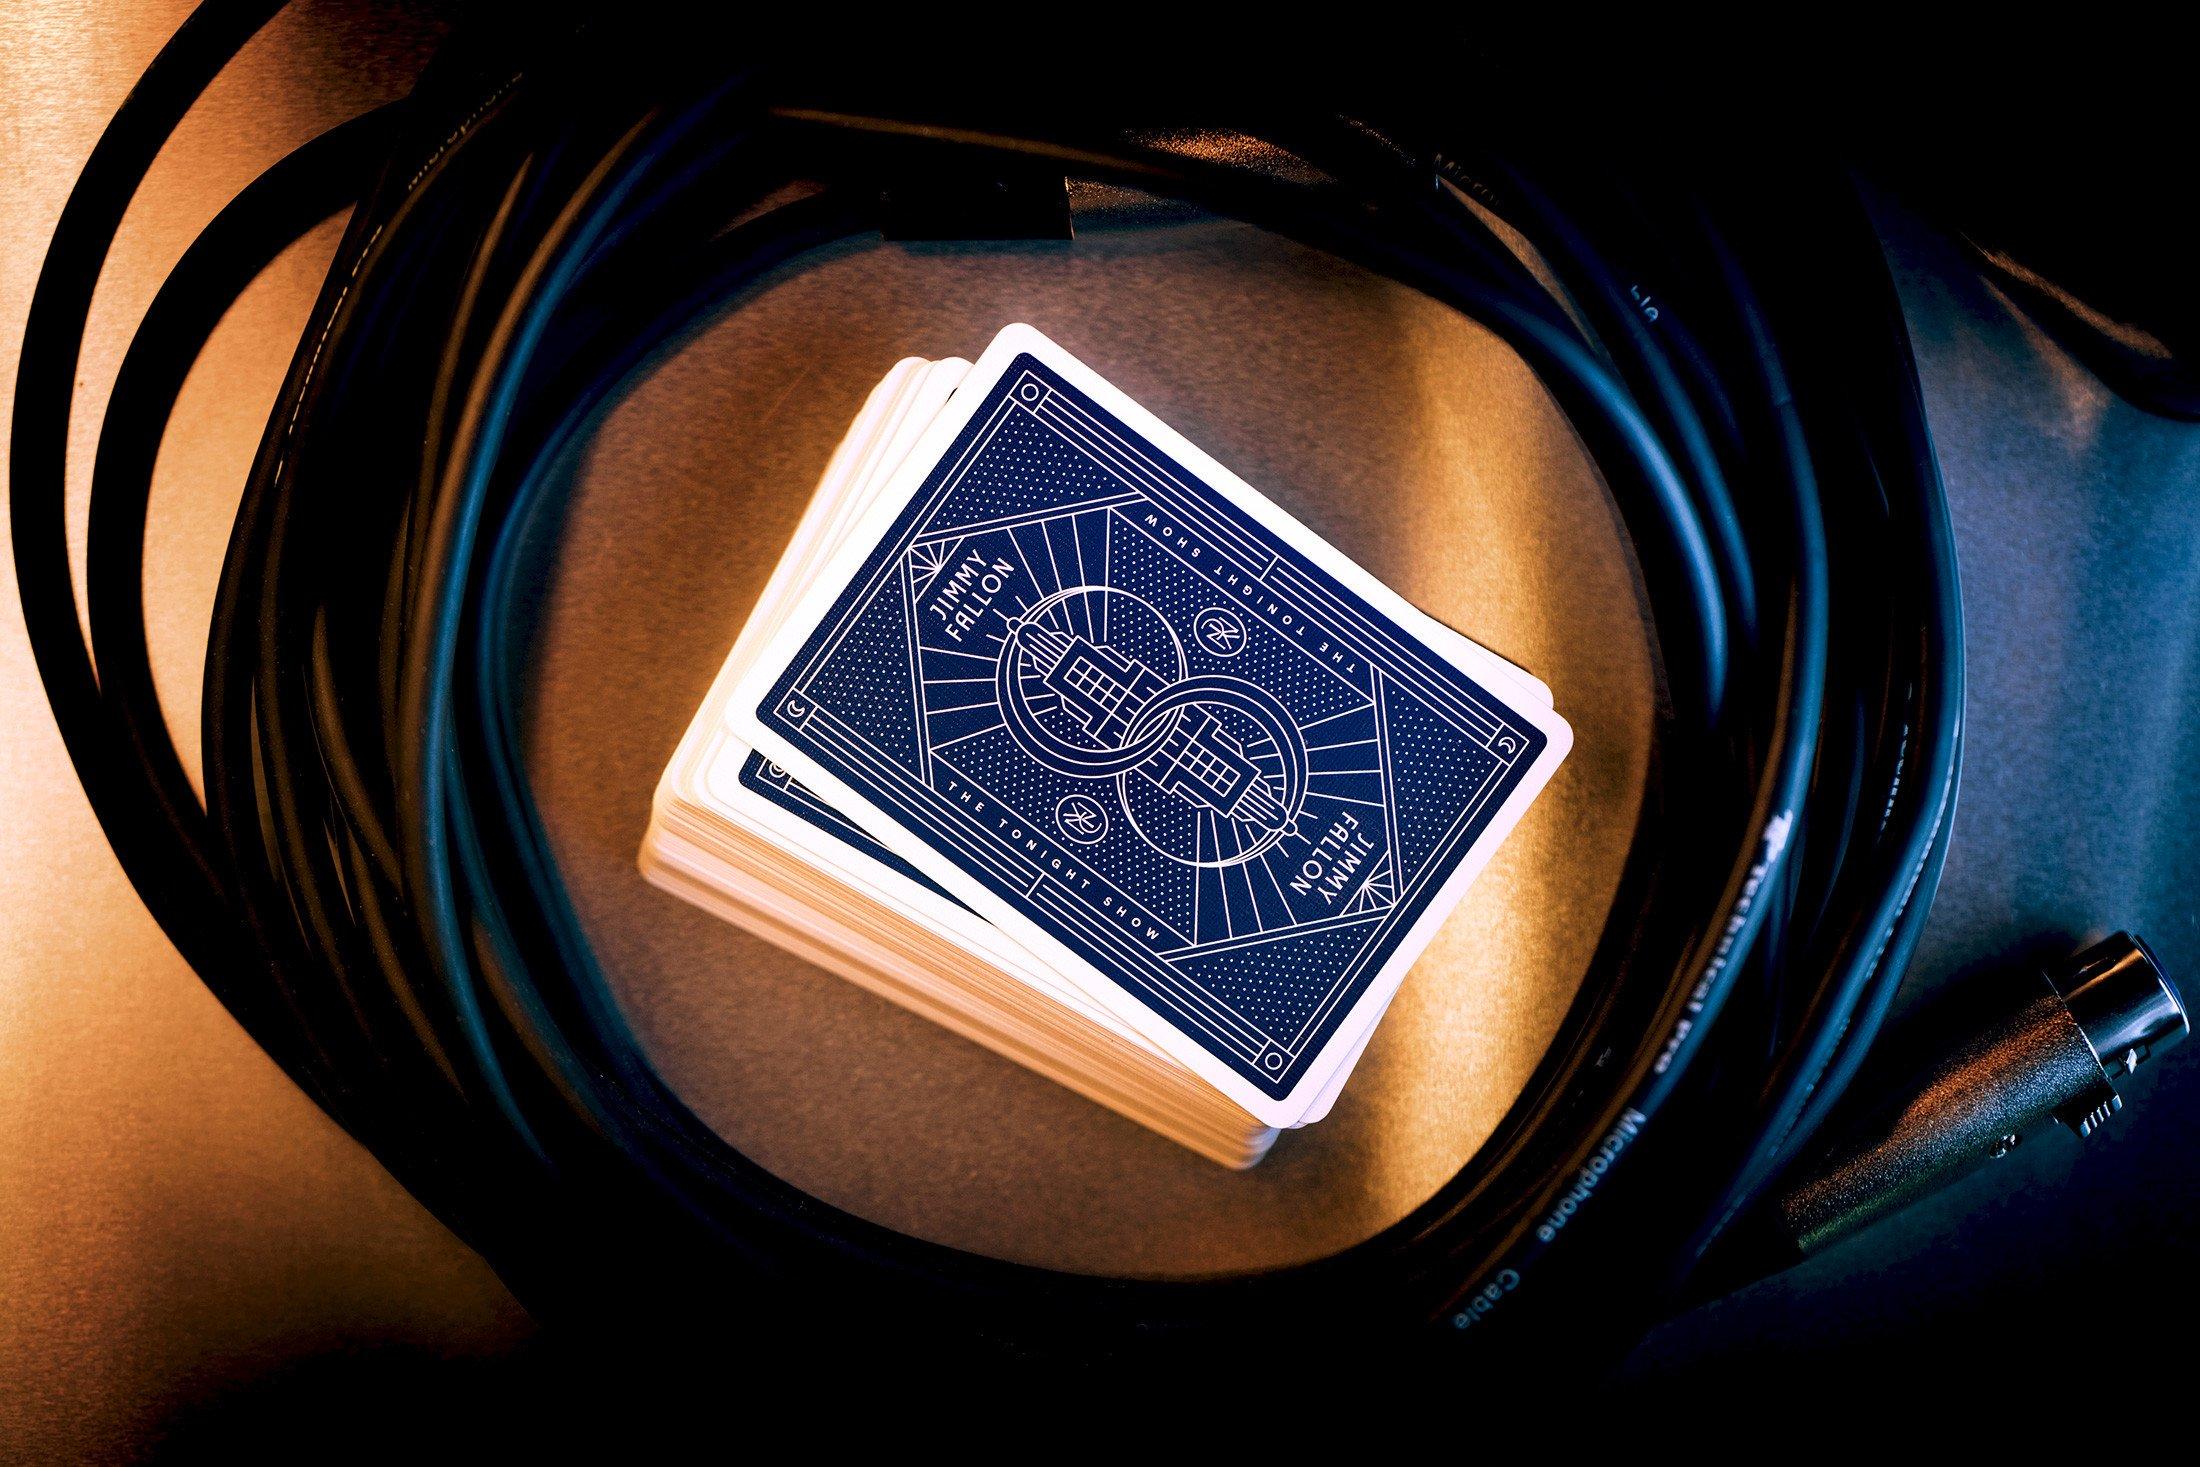 jimmy-fallon-playing-cards-02.jpg